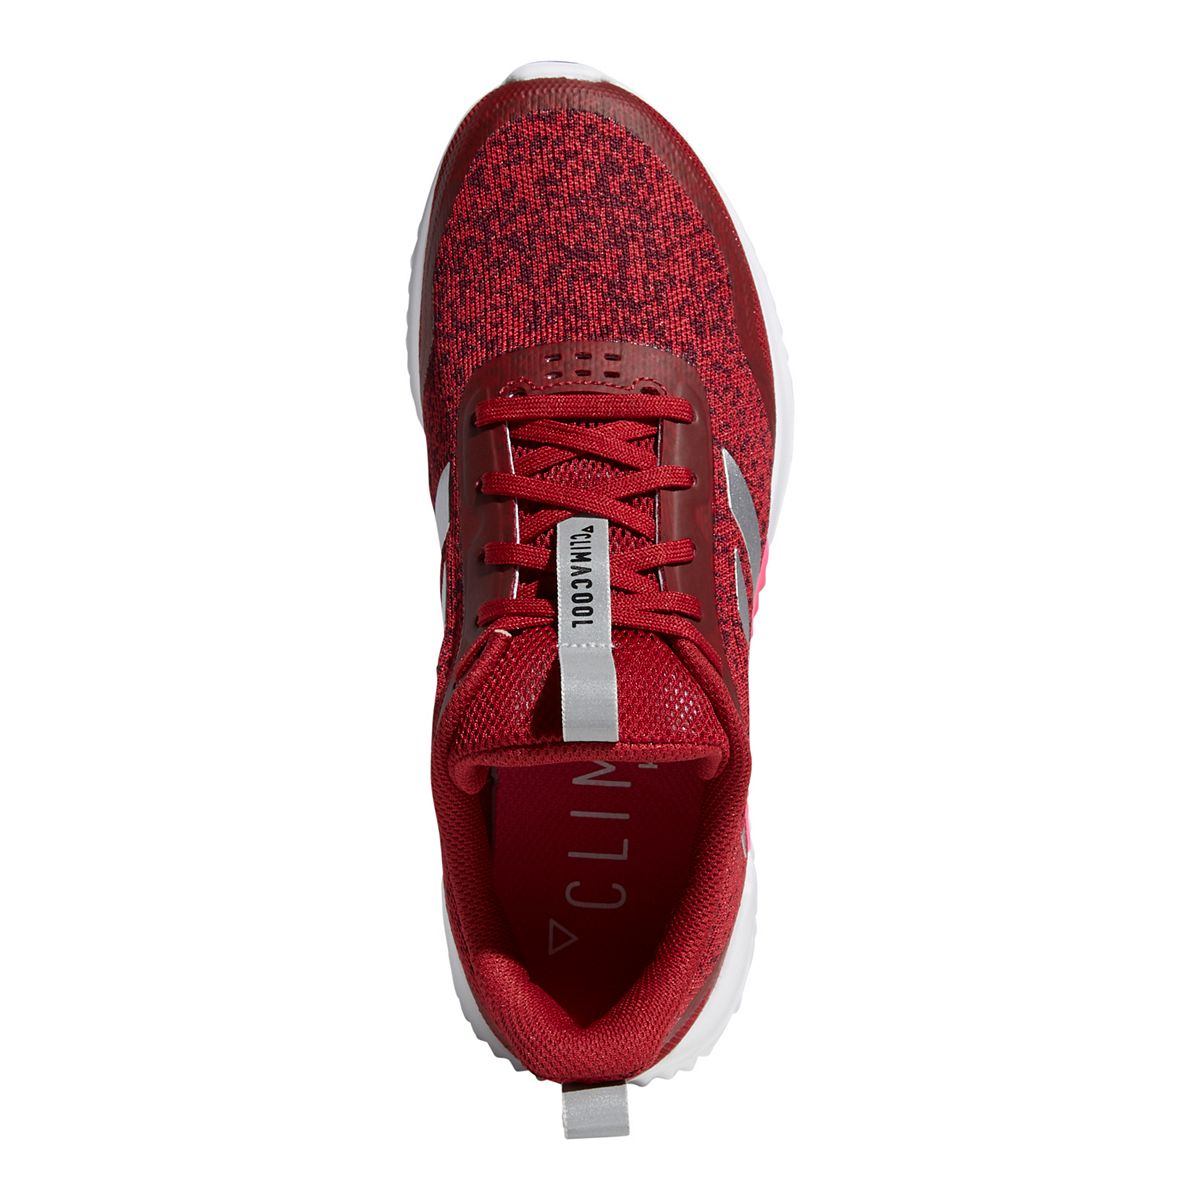 adidas Edge Runner LTD Women's Sneakers Active Maroon Silver 4lXFR